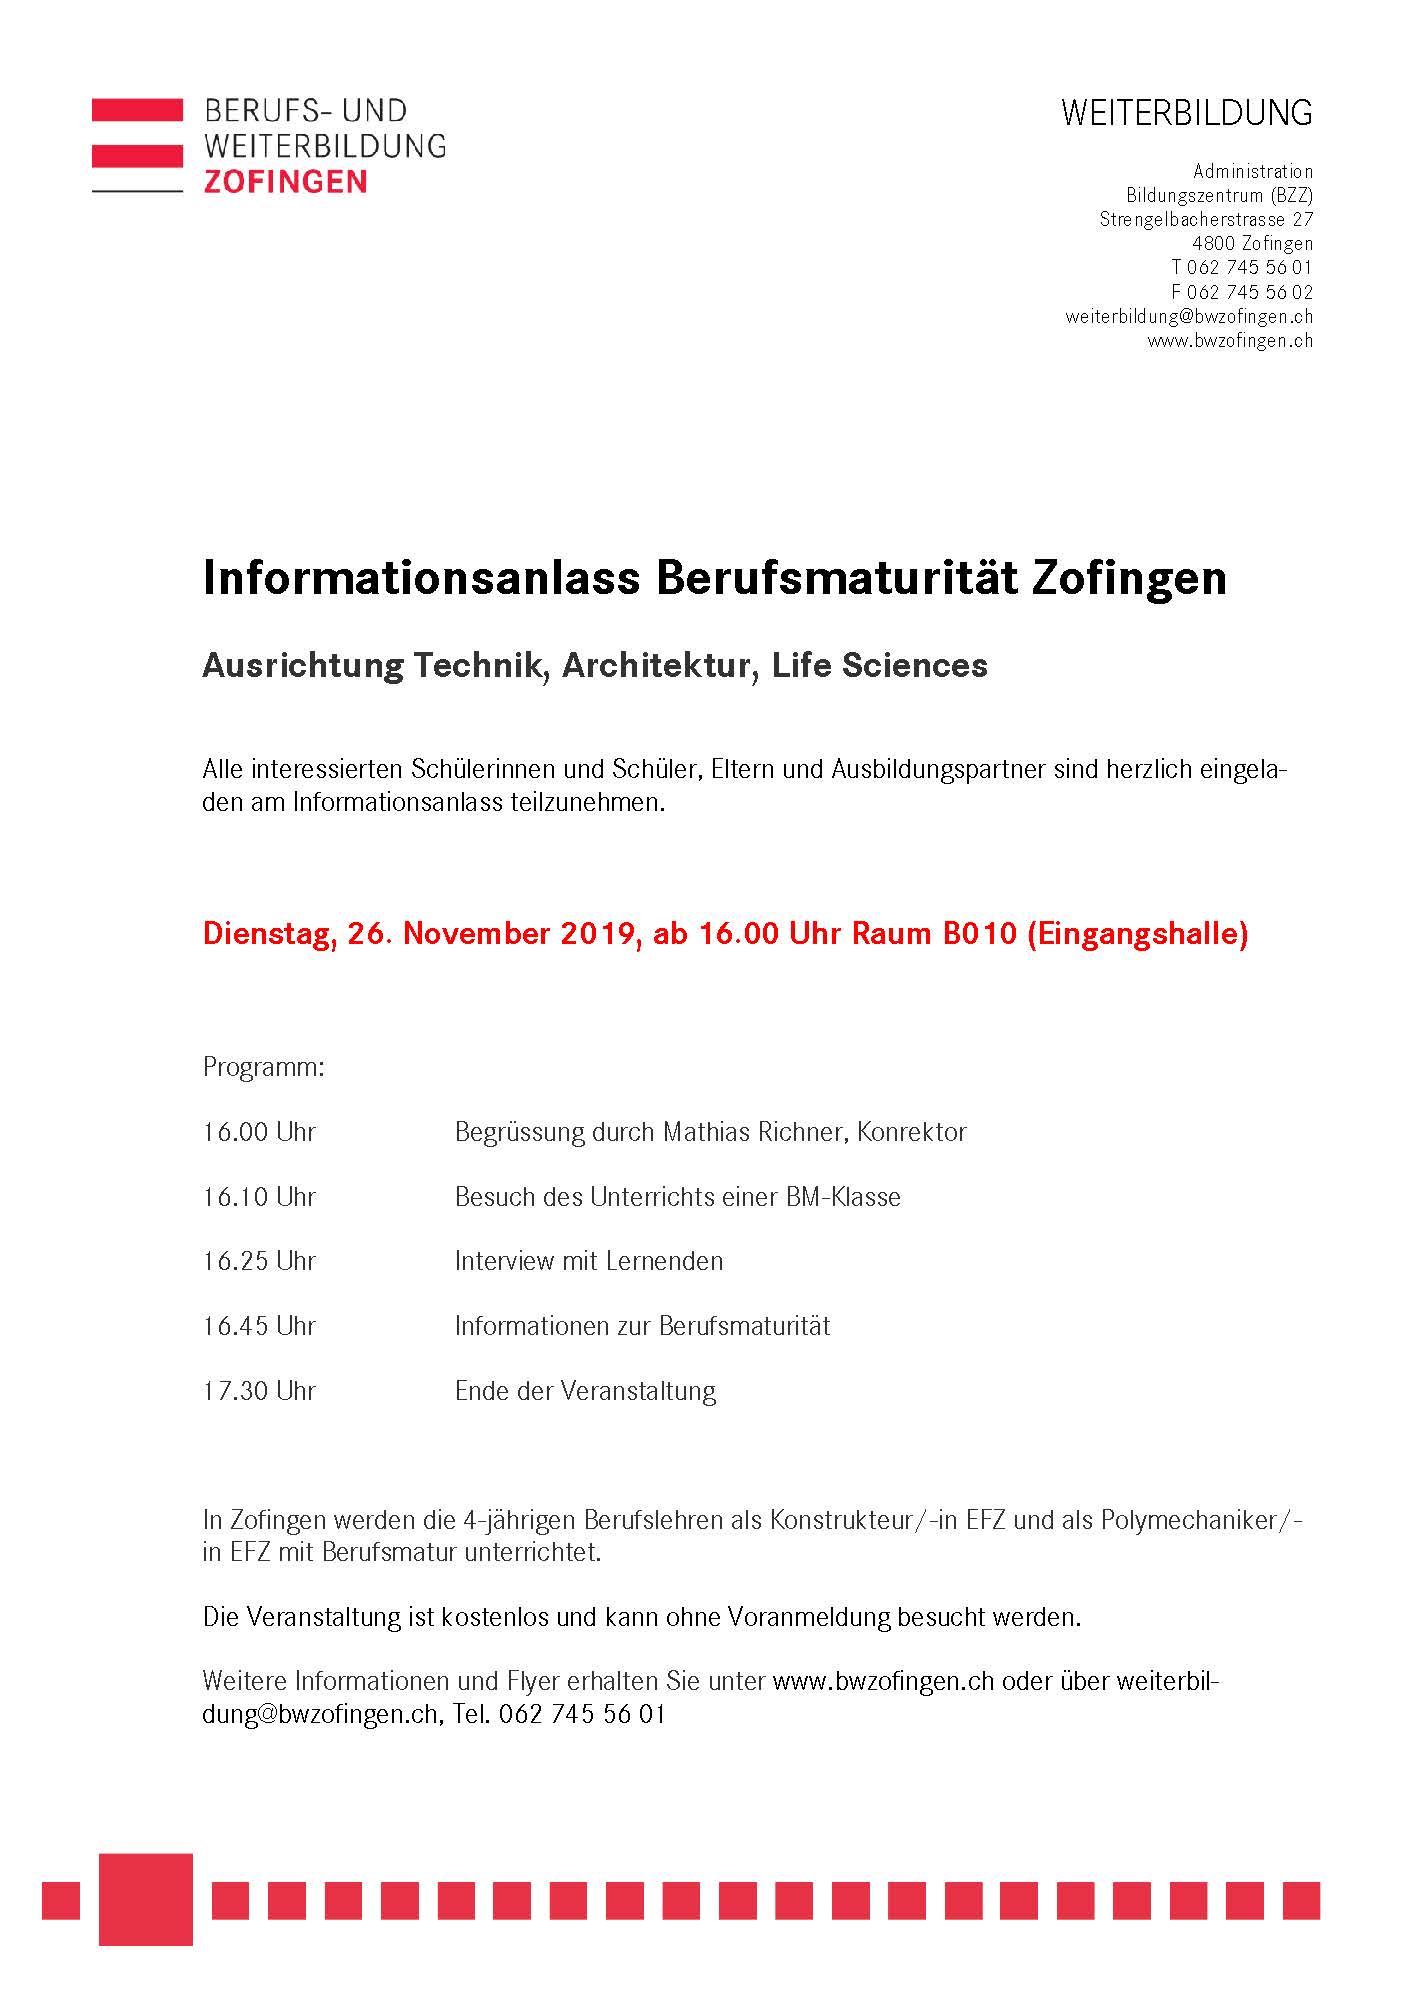 BM_Informationsanlass_Zofingen_2019_Website.jpg